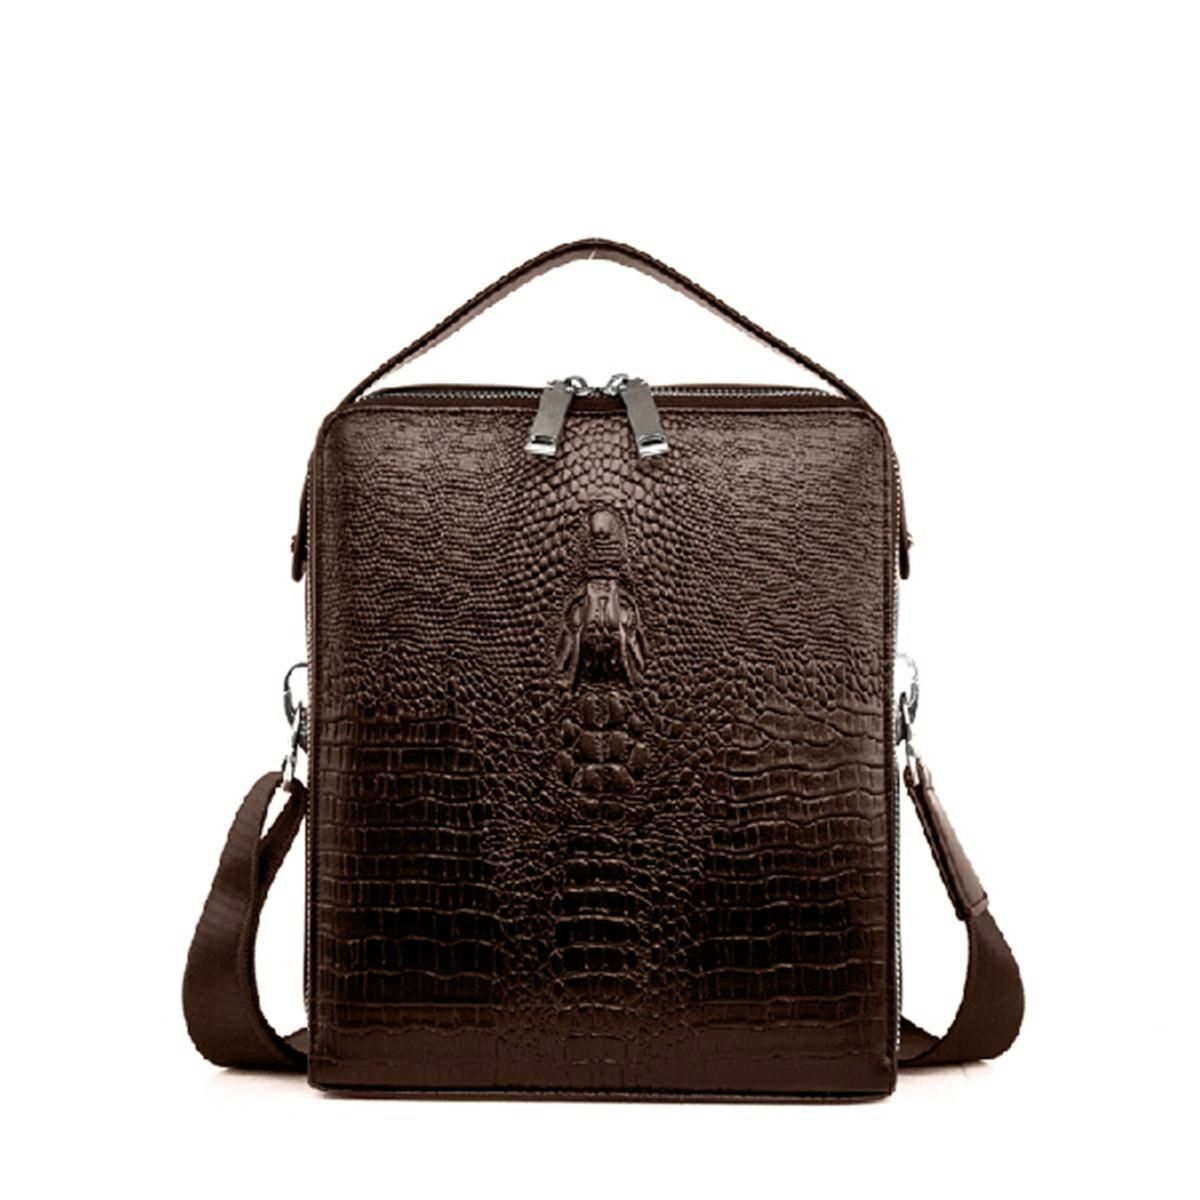 0d626524448a Generic Men Genuine Leather Multi-function Shoulder Bag Business Crocodile  Handbag Briefcase khaki. updating Prices